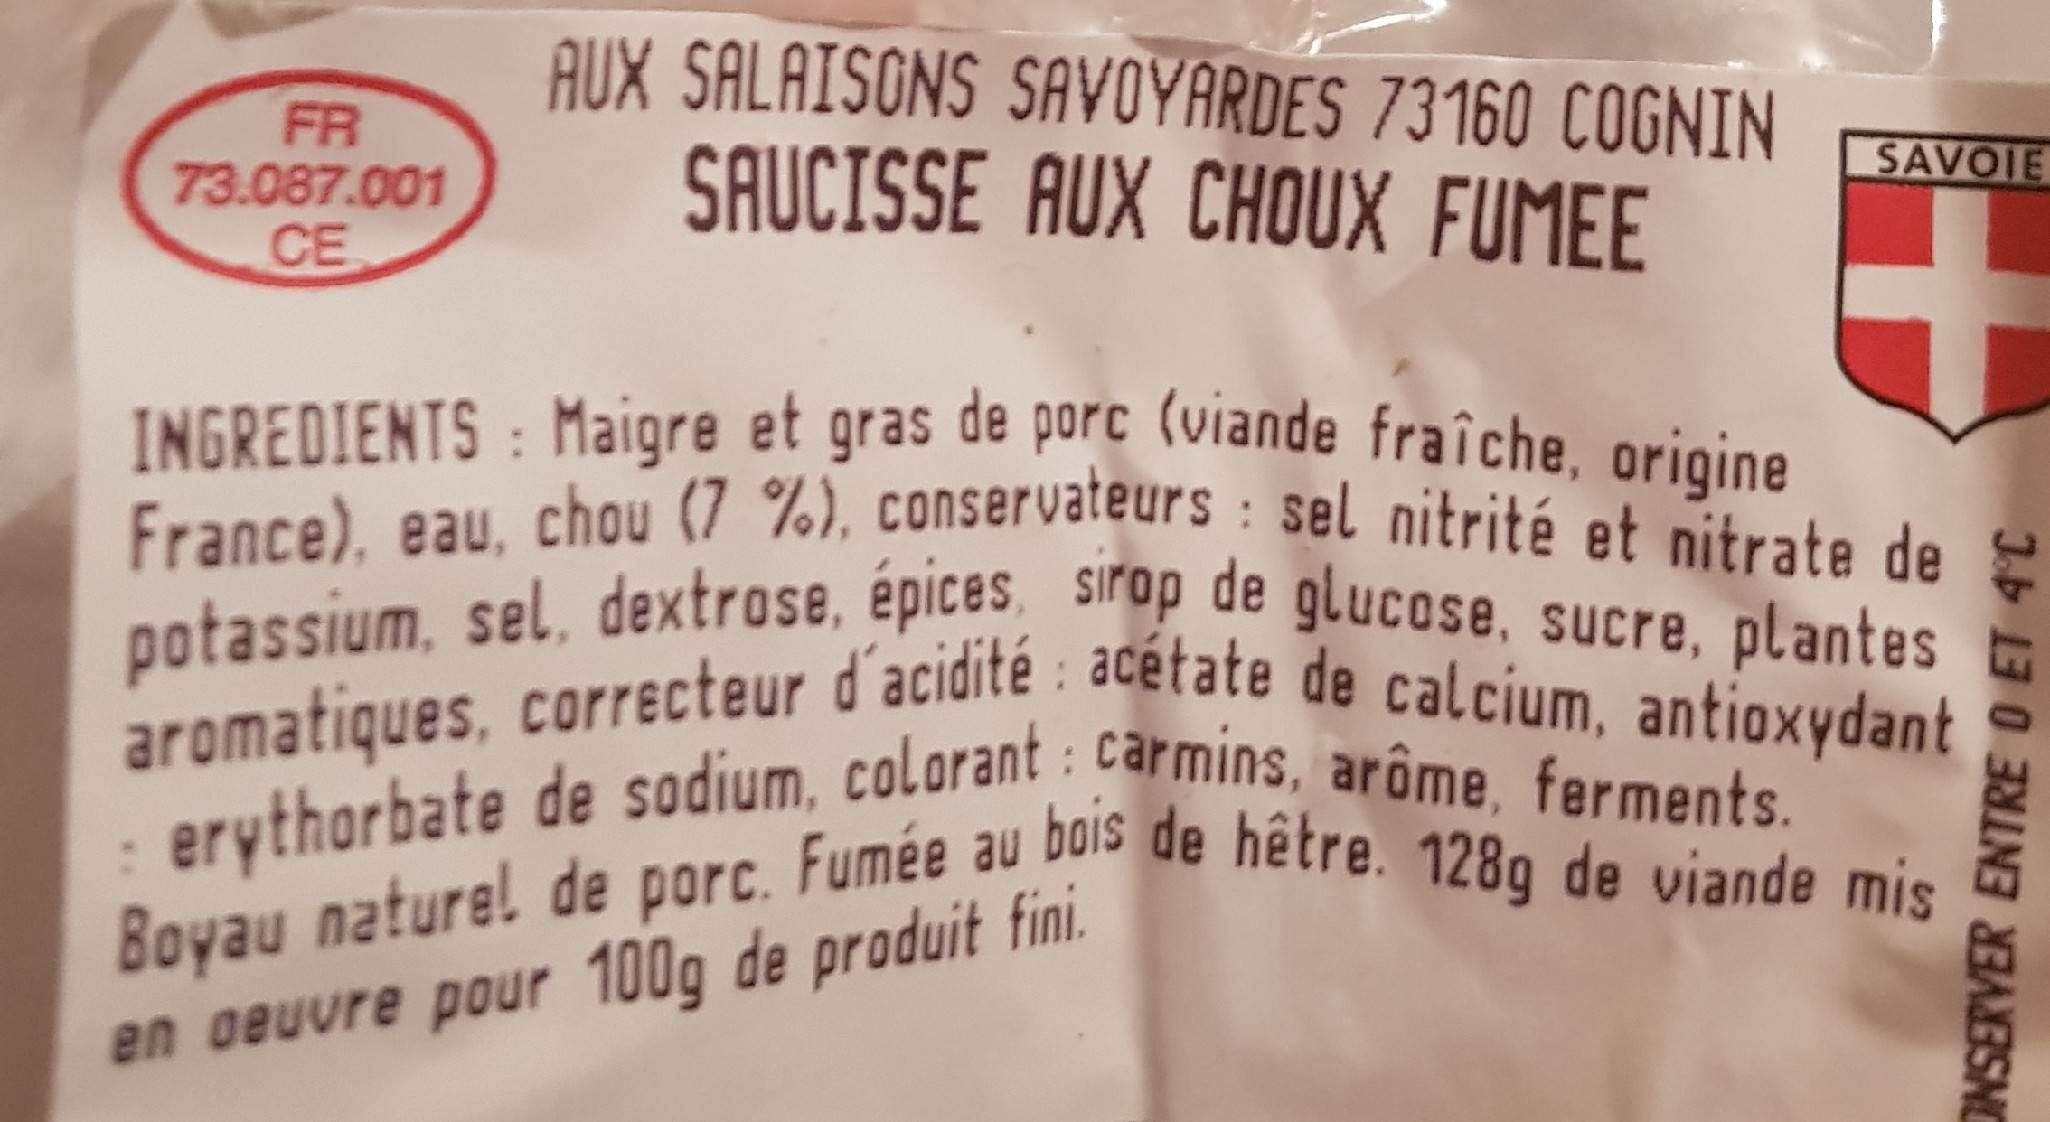 Saucisse aux choux fumée - Ingrediënten - fr